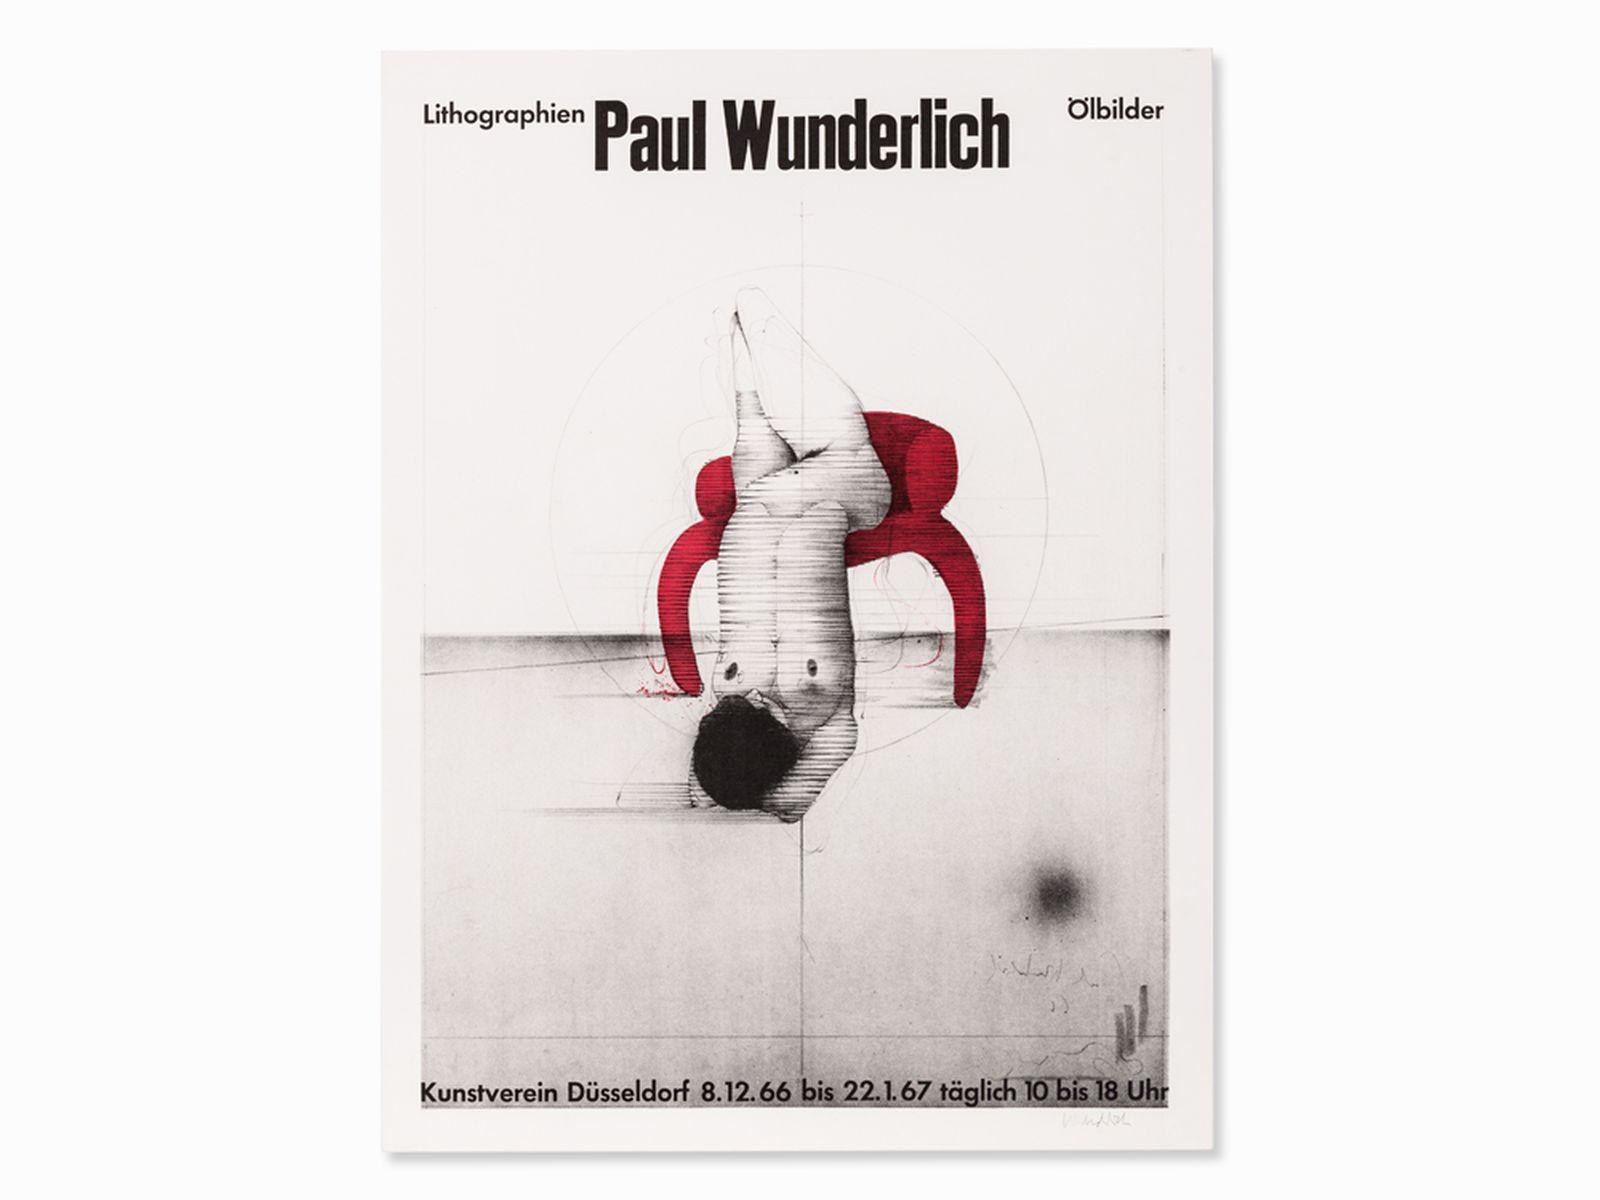 #123 Paul Wunderlich Image